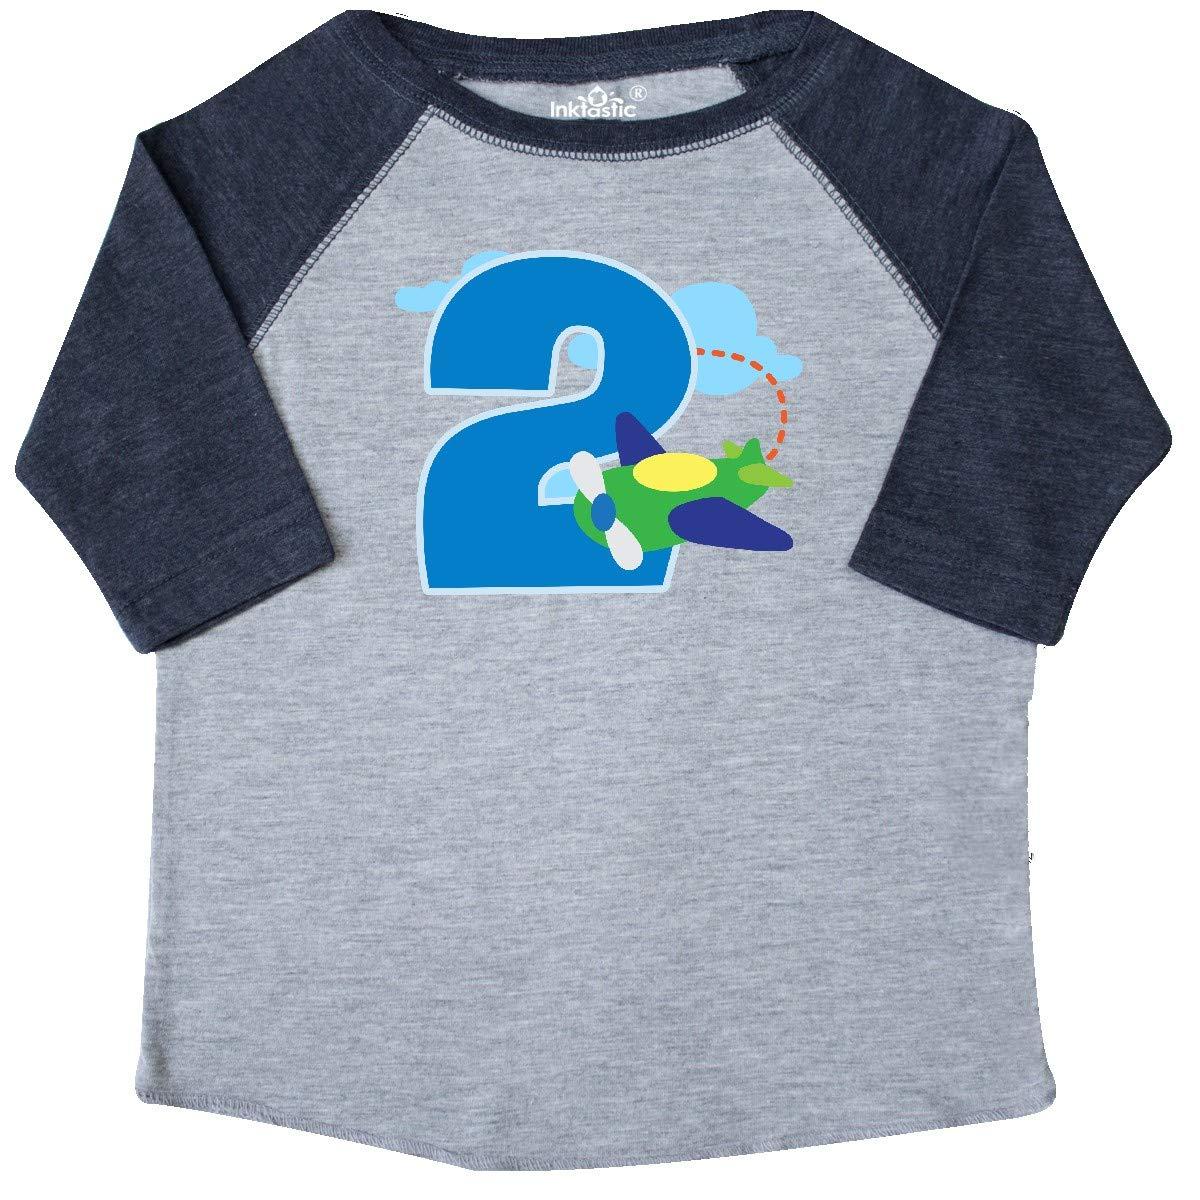 inktastic 2nd Birthday Airplane Boys 2 Year Old Toddler T-Shirt